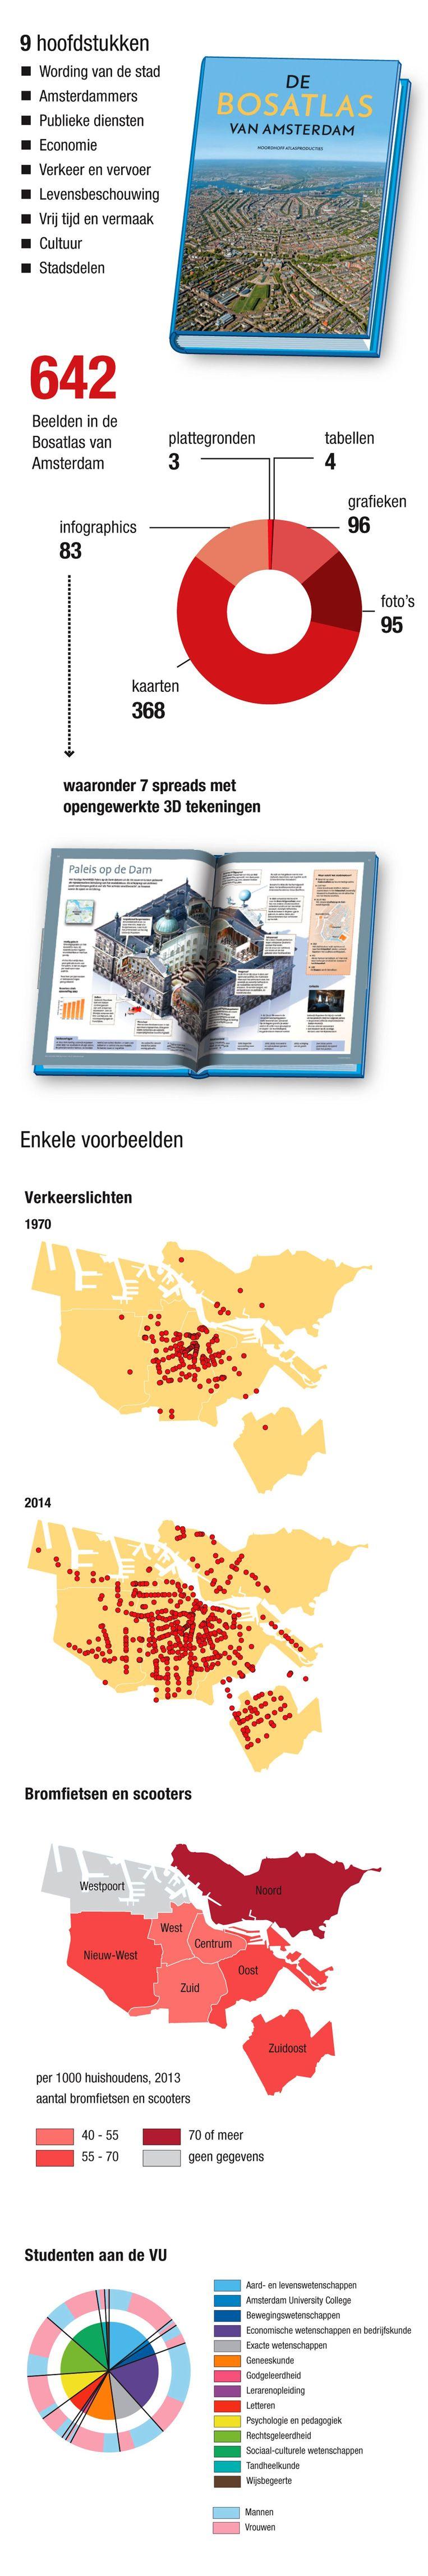 null Beeld Bosatlas OIS/Gemeente Amsterdam/GVB)